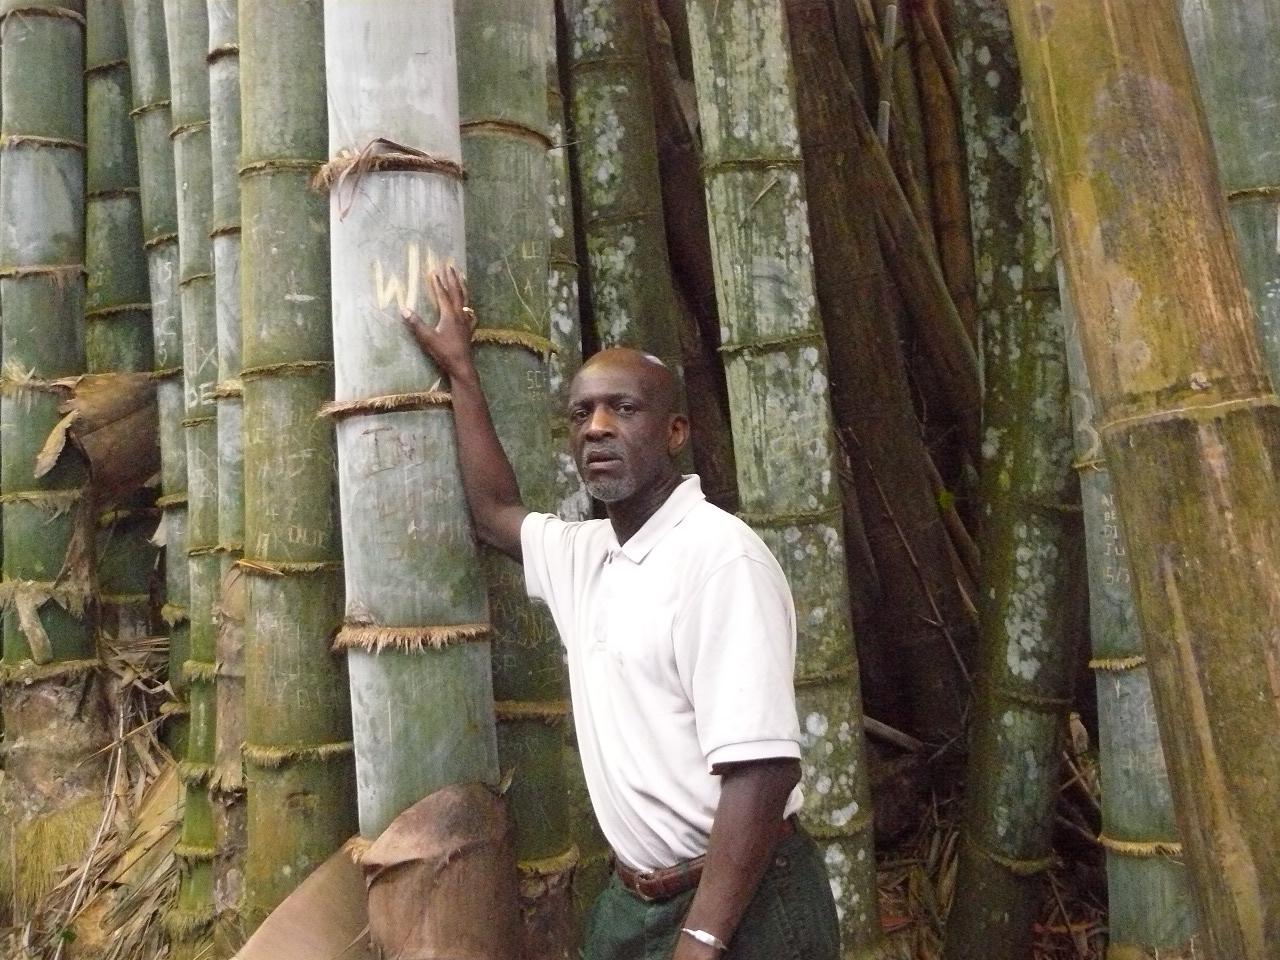 Mayotte_Combani_Bamboo_Géants_MJ_Vieyra_34